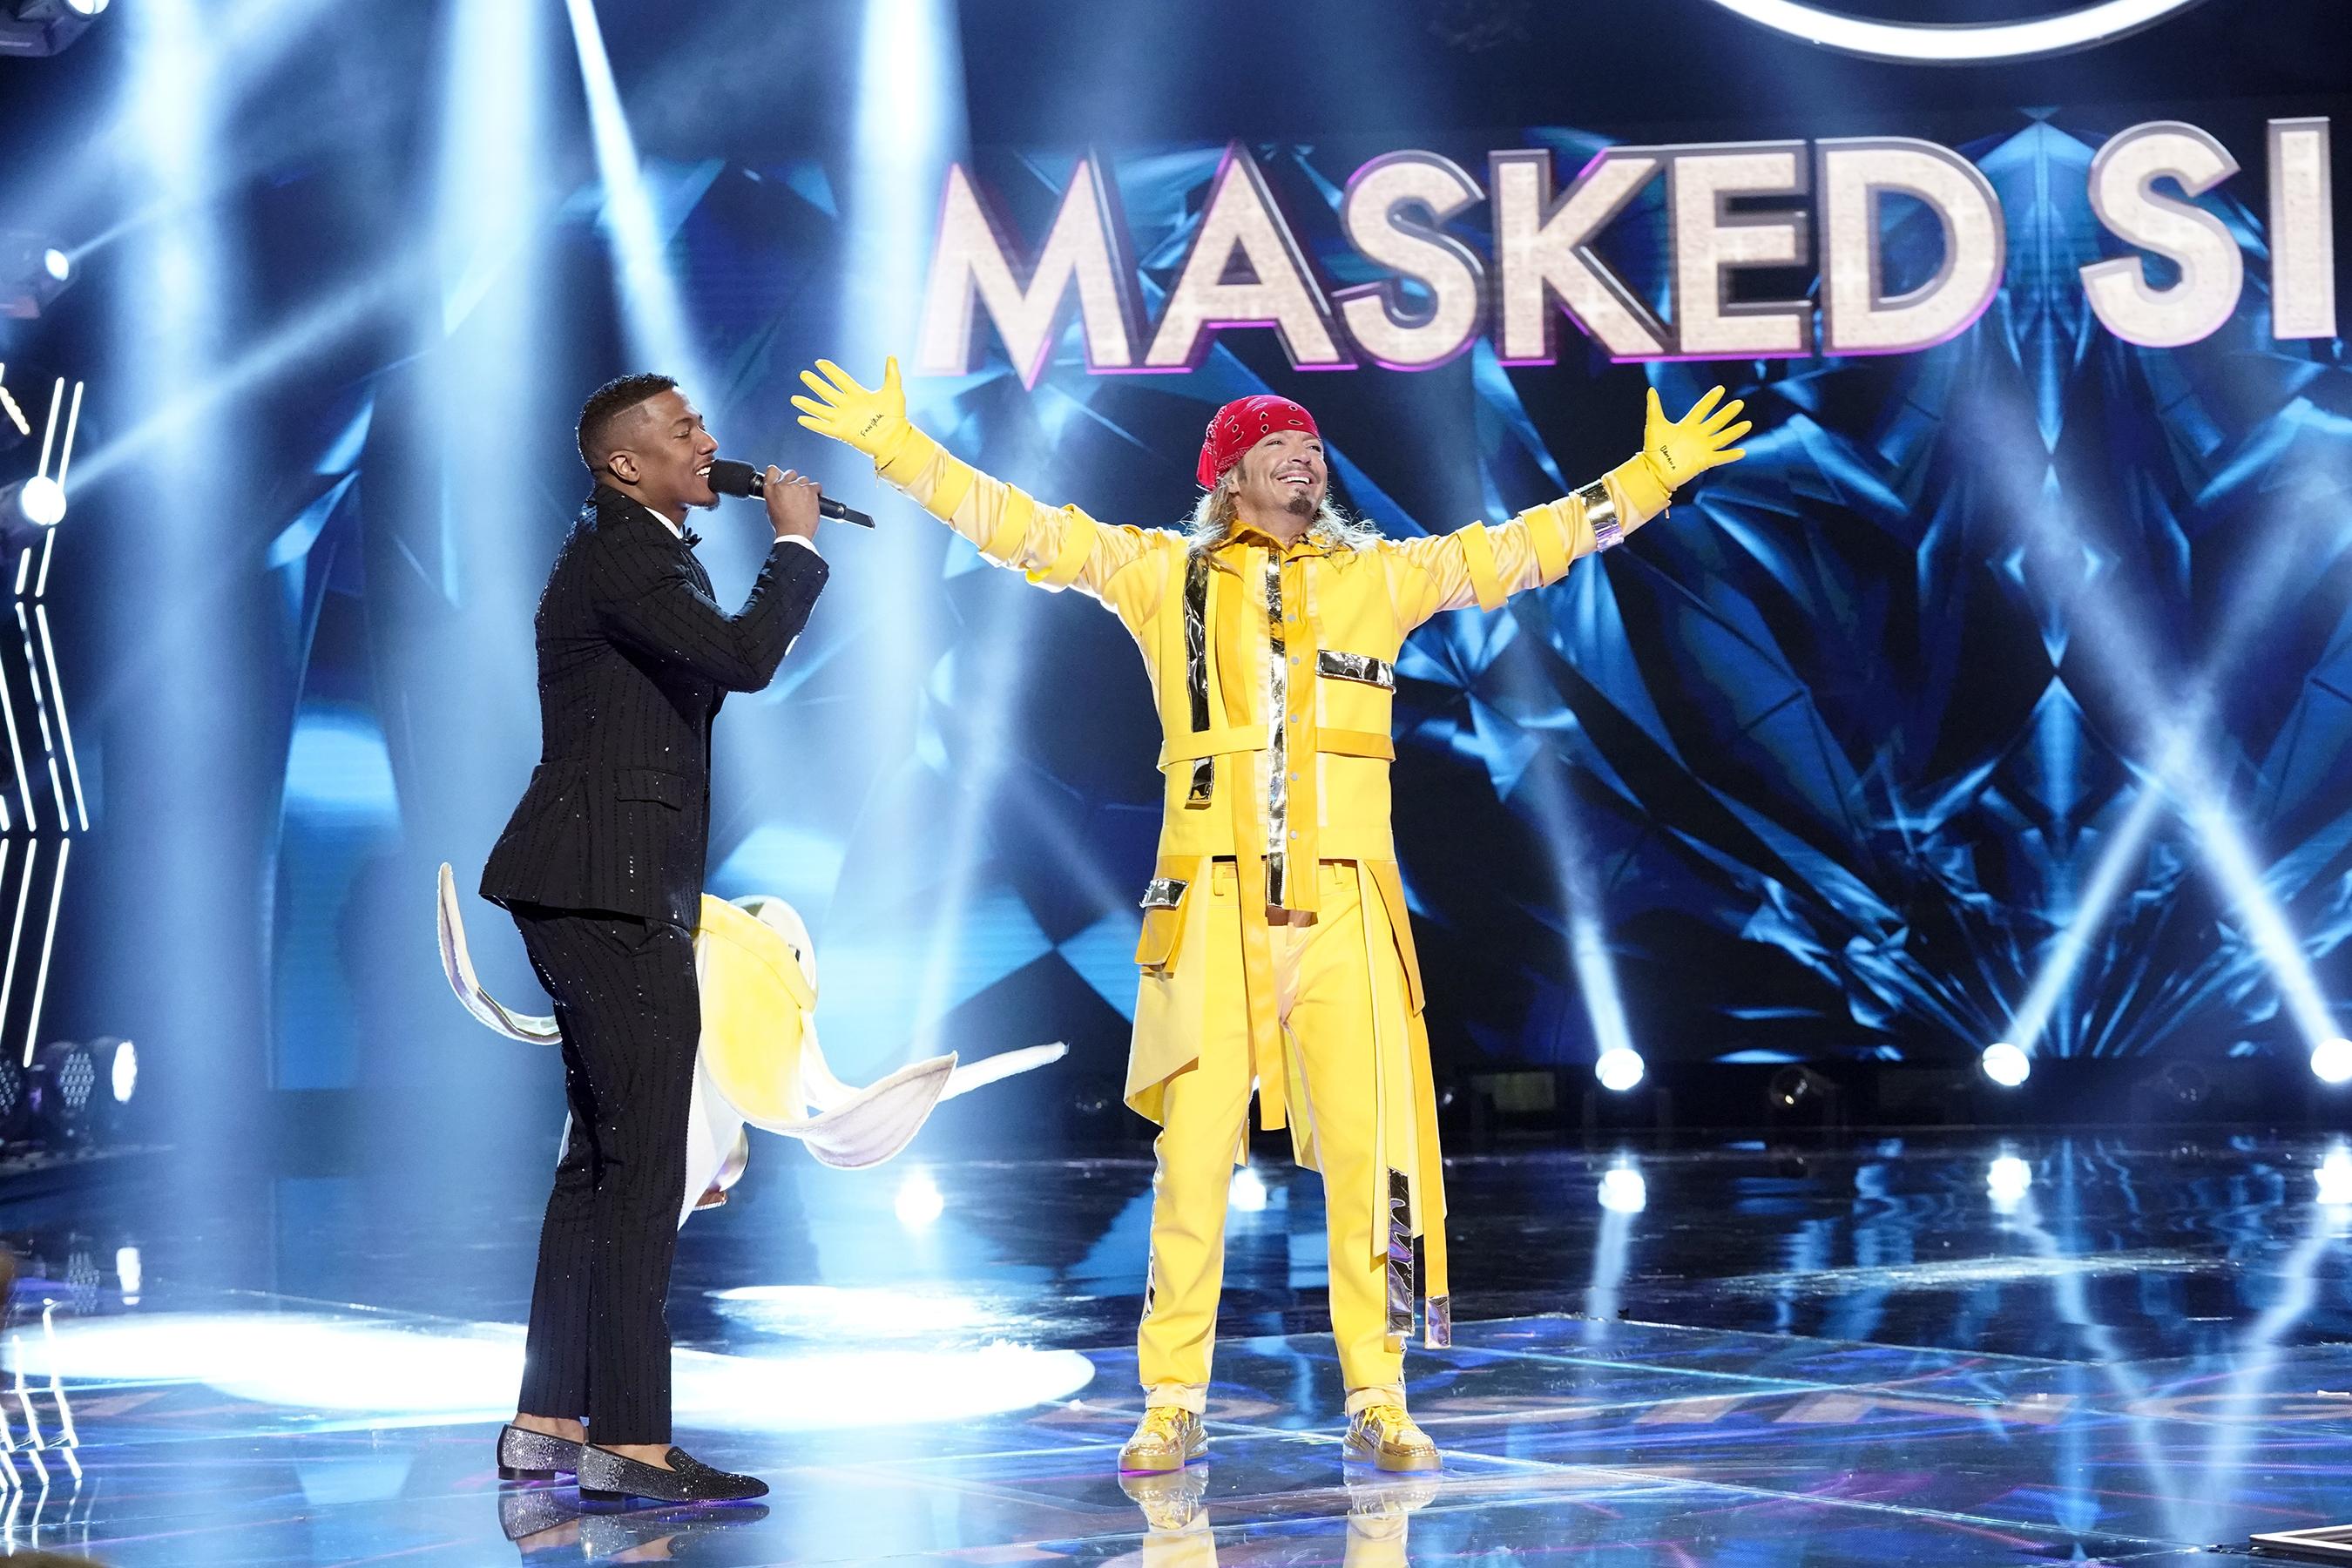 The Masked Singer, Banana, Bret Michaels, Nick Cannon